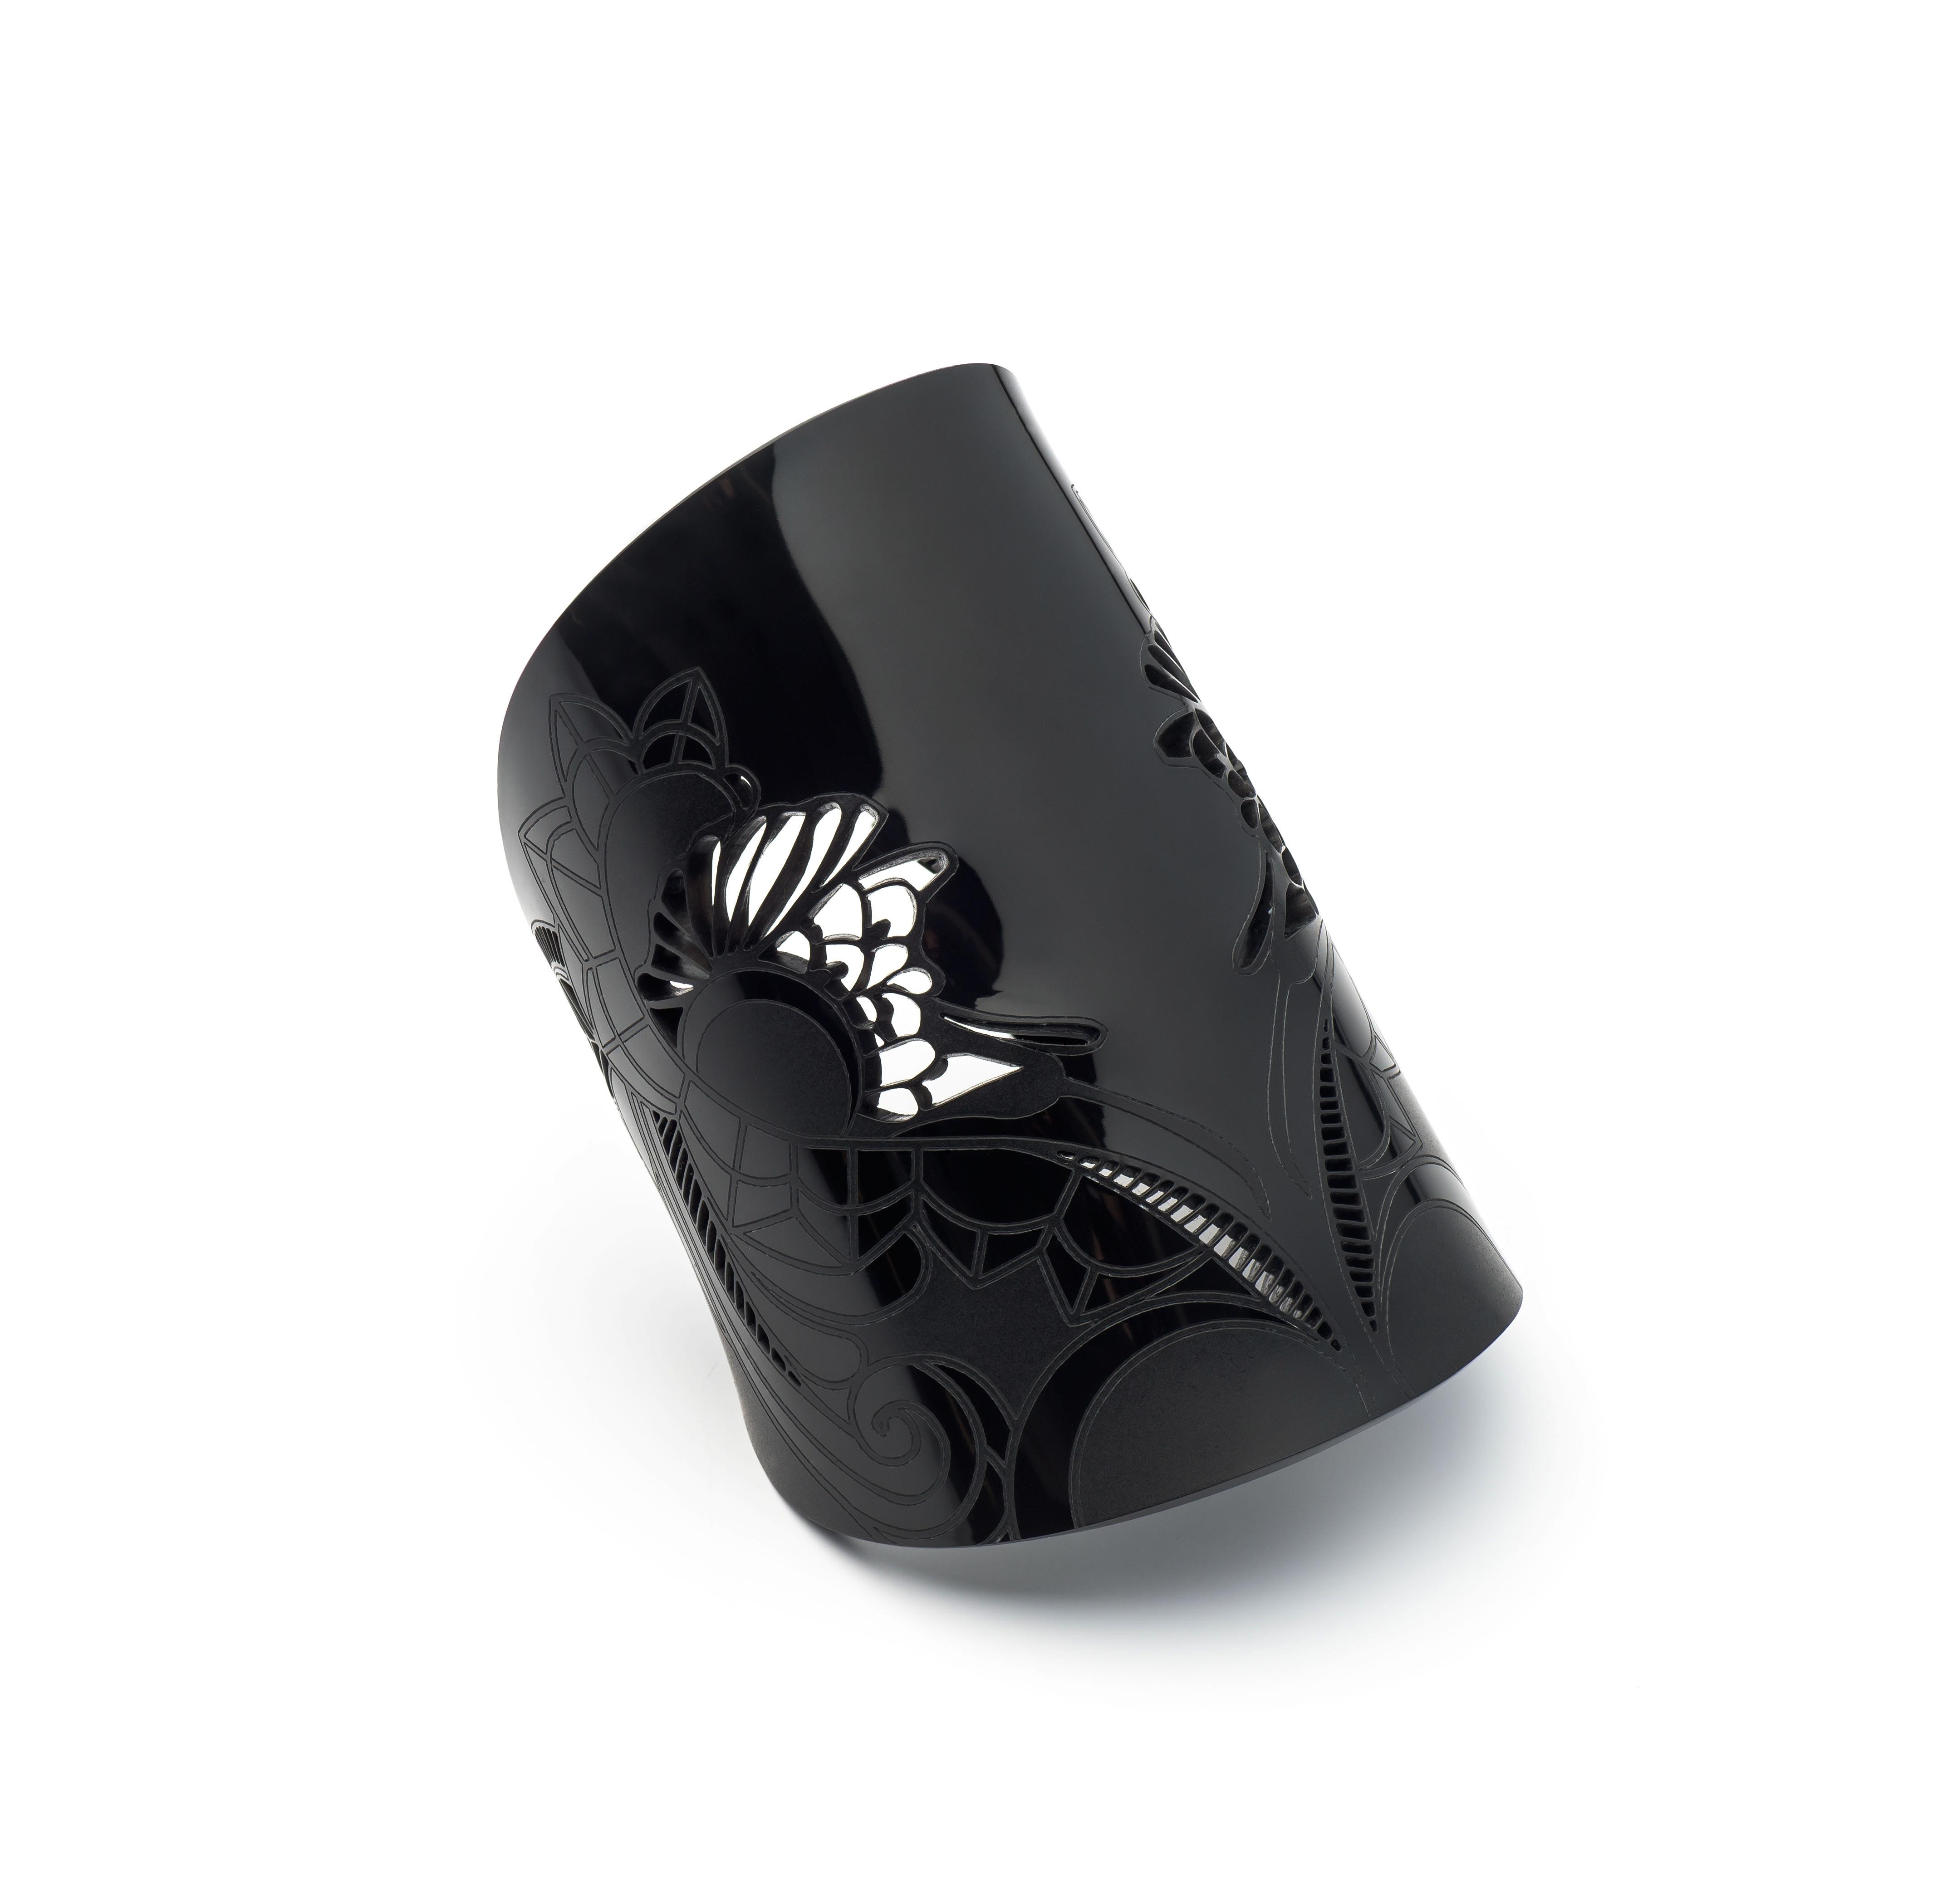 'Irezumi Black' Wrist Cuff - £125